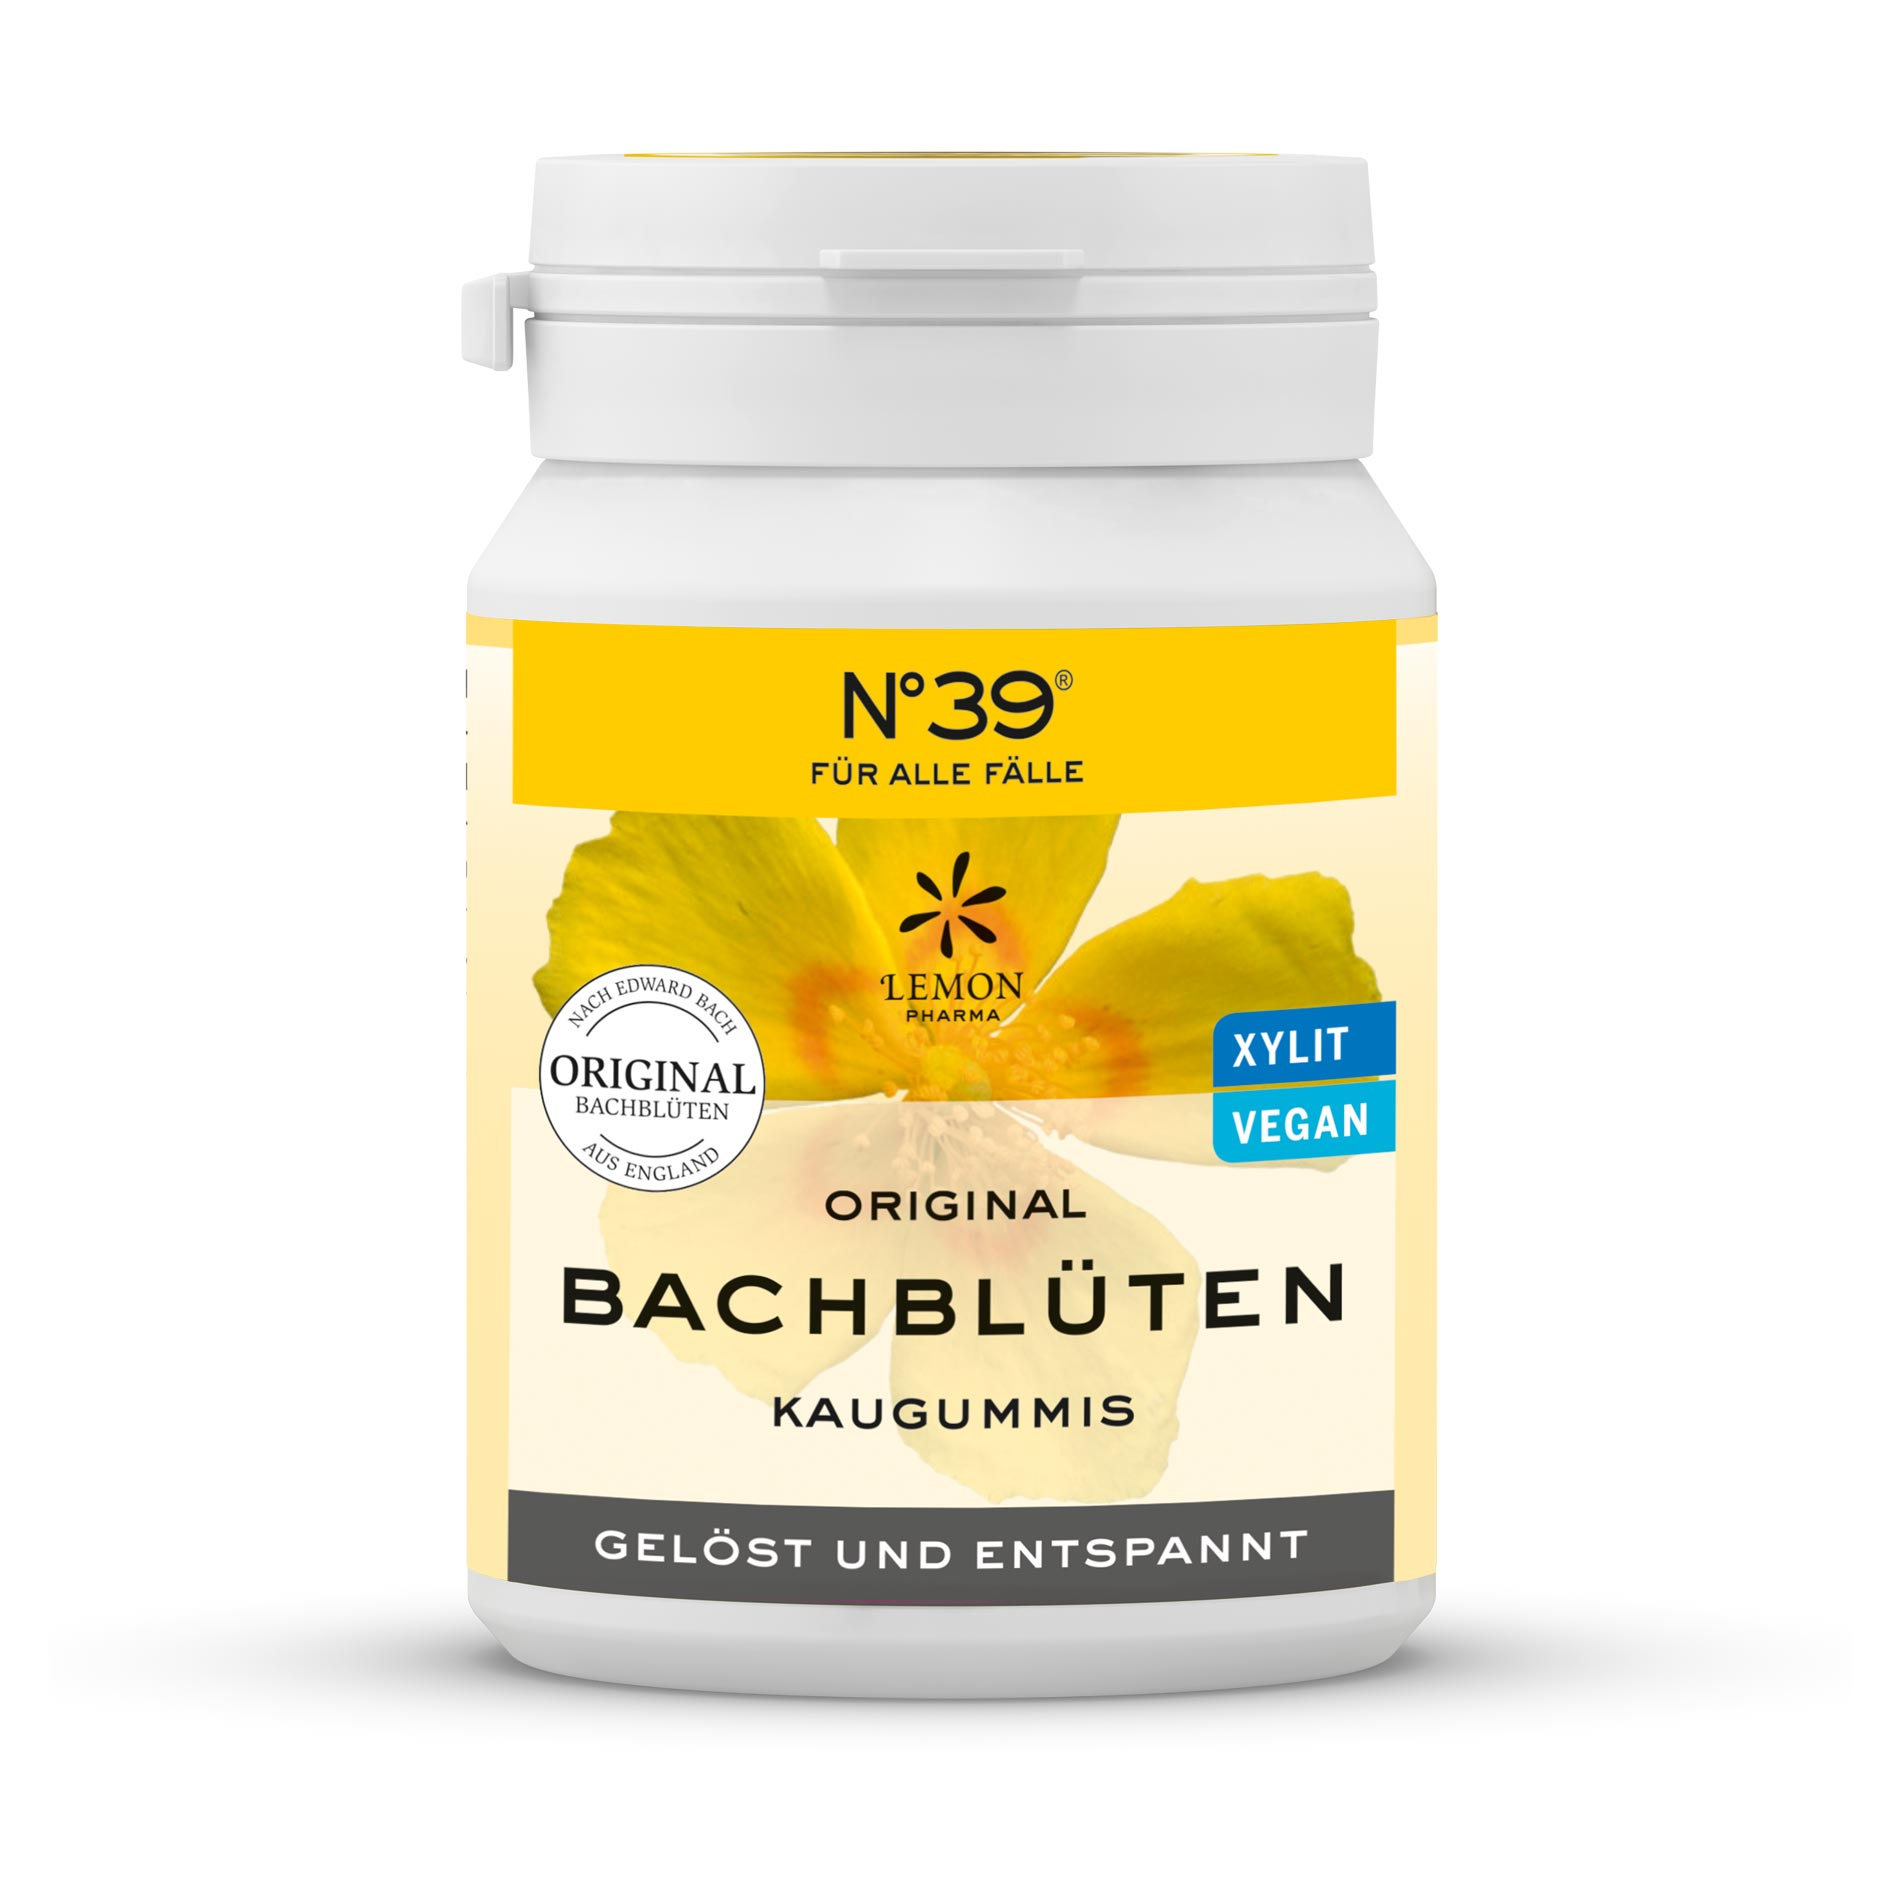 Chicles Nº 39rescate Lemon Pharma Original Flores de Bach, Rescue